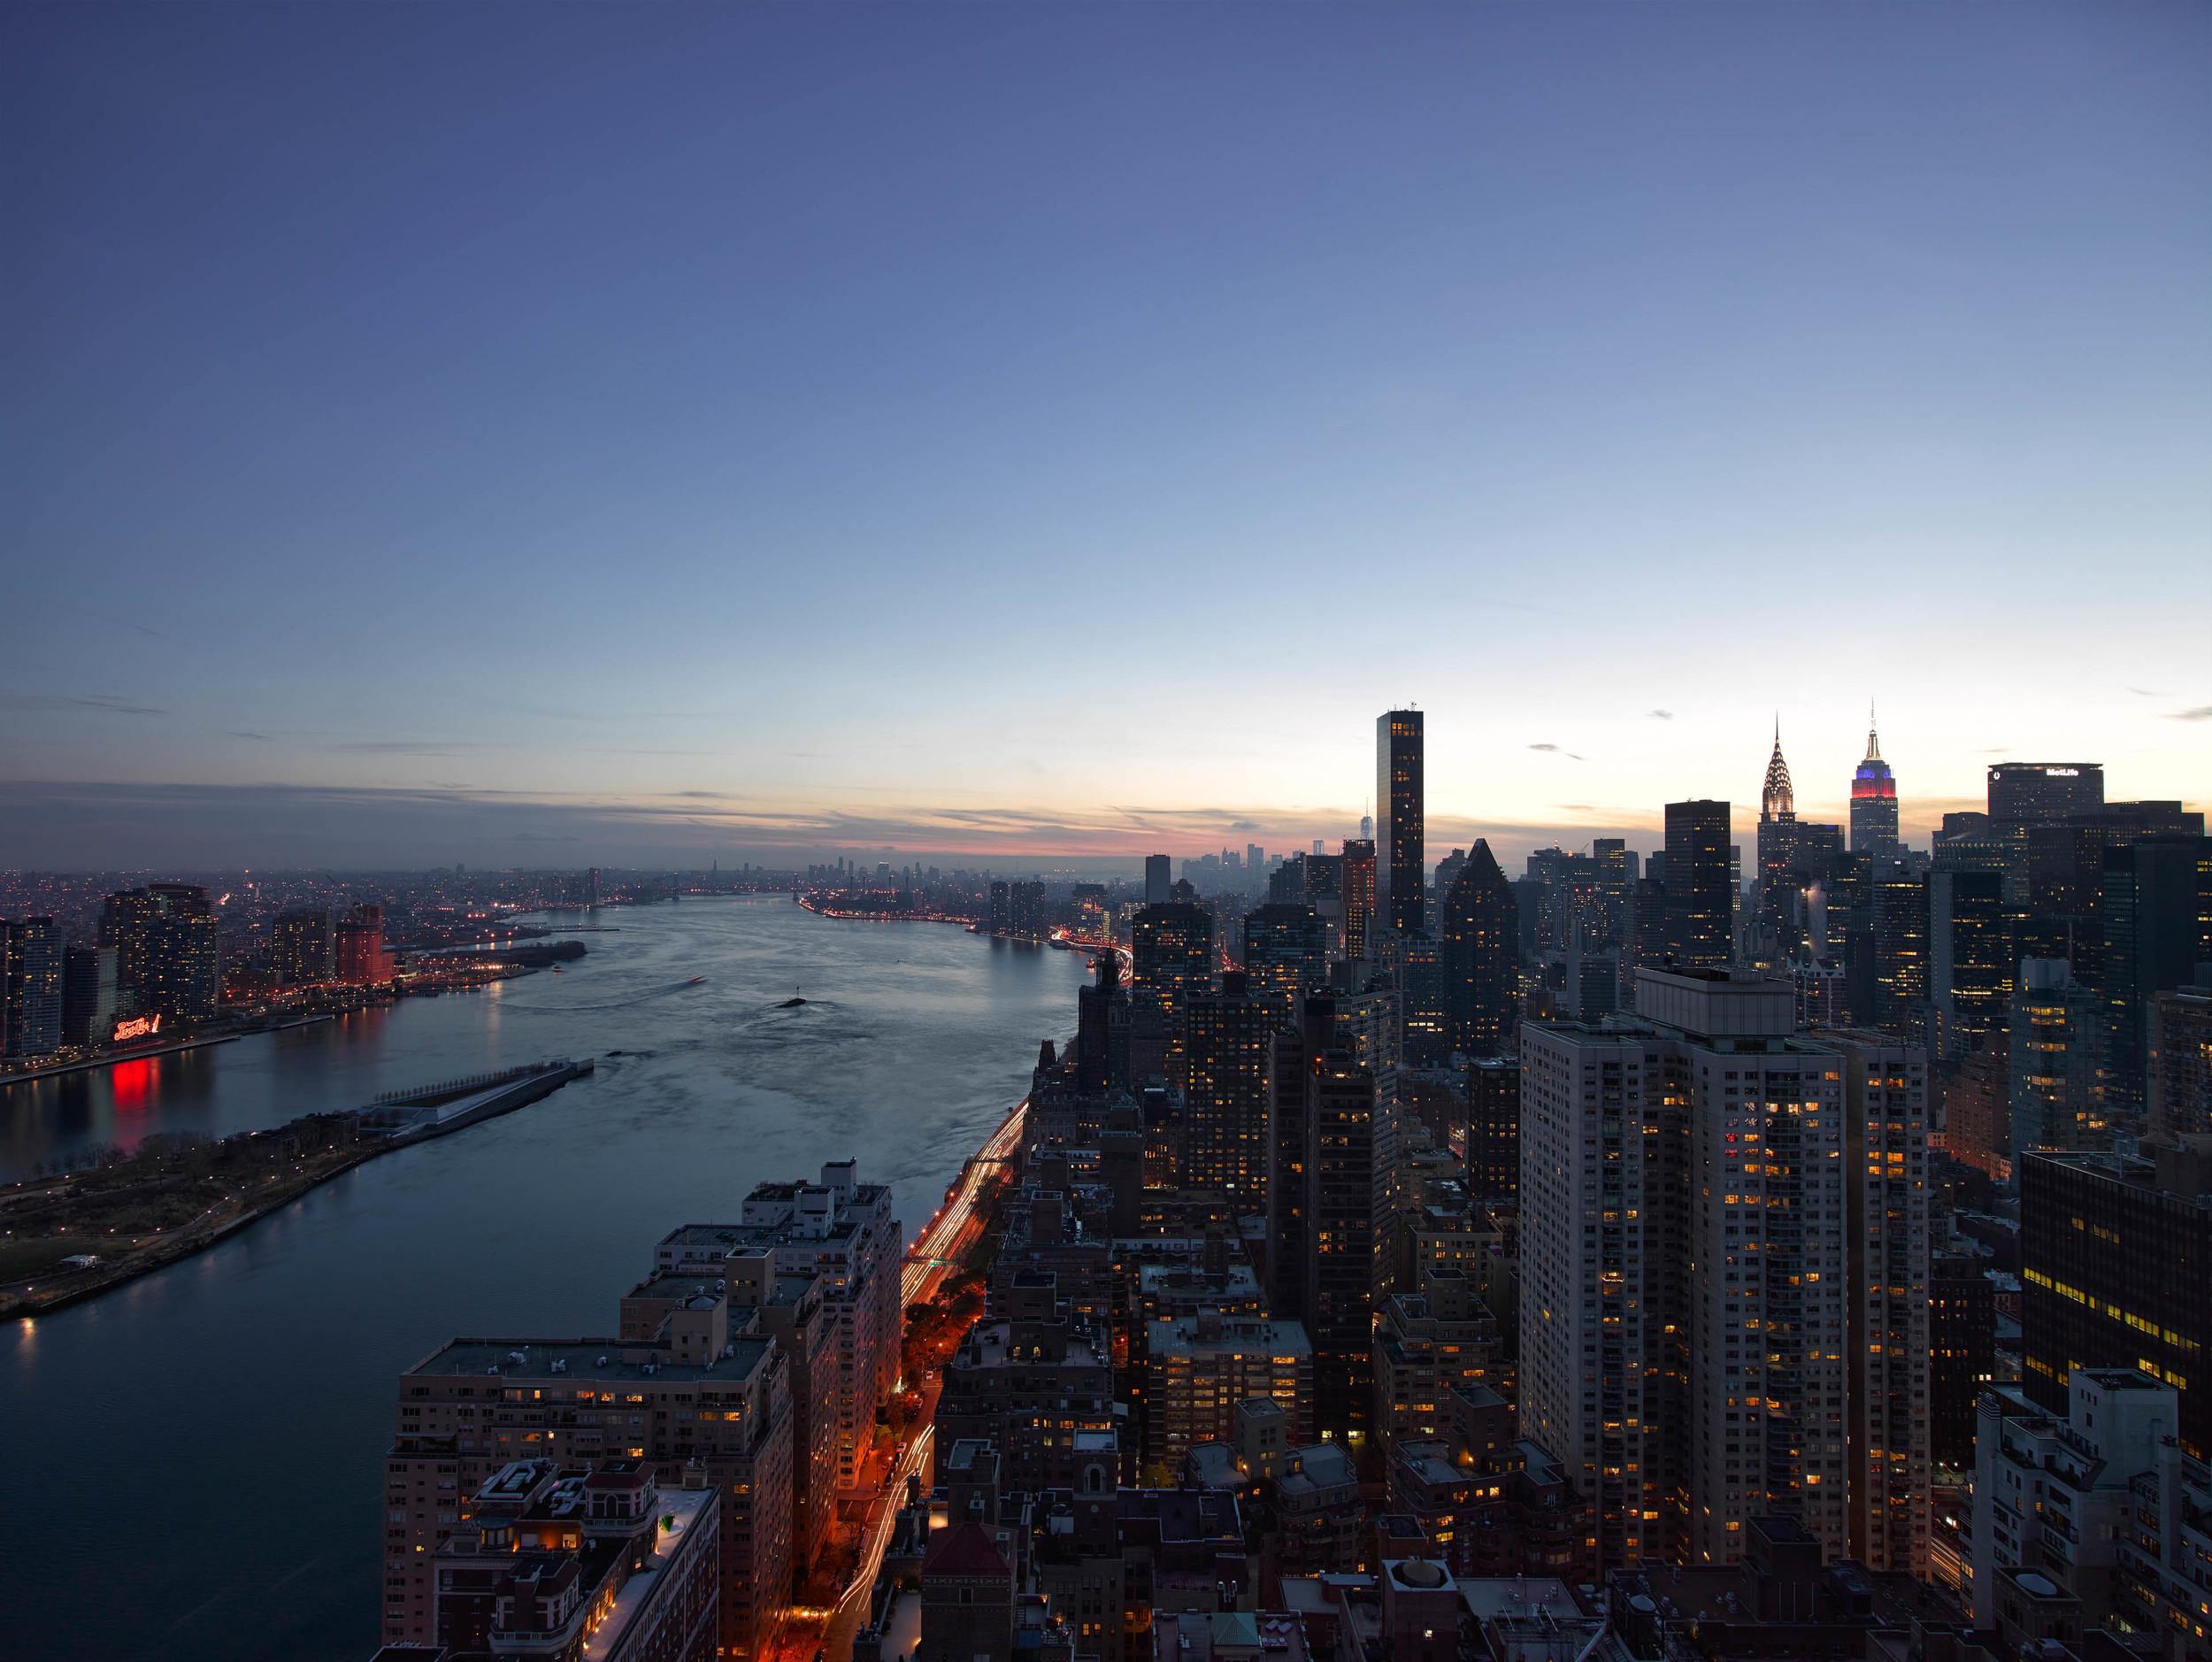 KARSTEN STAIGER    NEW YORK LOVE STORY   Title:      NOVEMBER 17,2013         Edition of 5   44 x 32 inches  Kodak Metallic with white ArtBox        $3,500.00